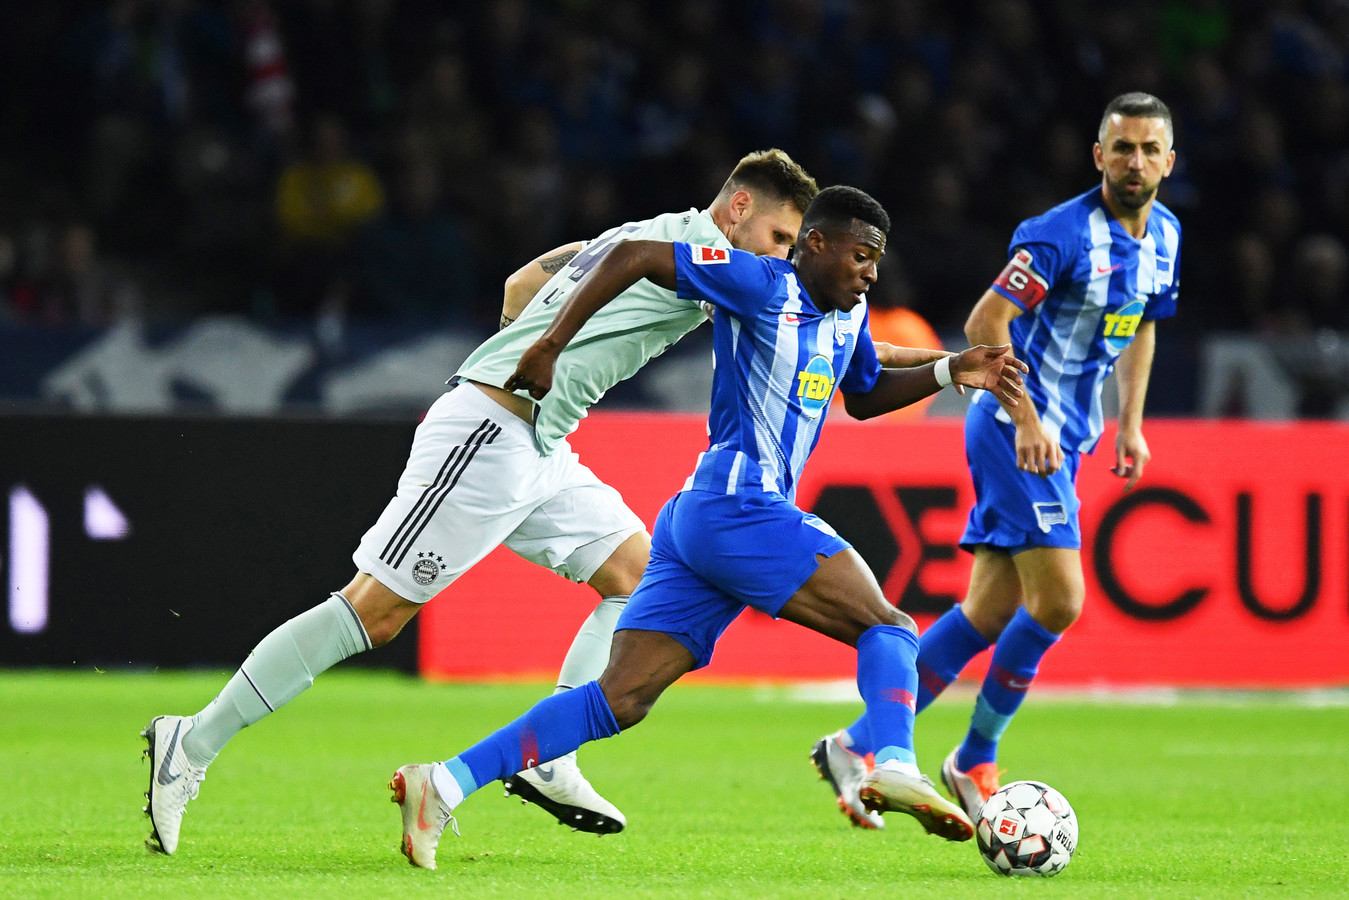 Javairo Dilrosun in actie tegen Bayern München.